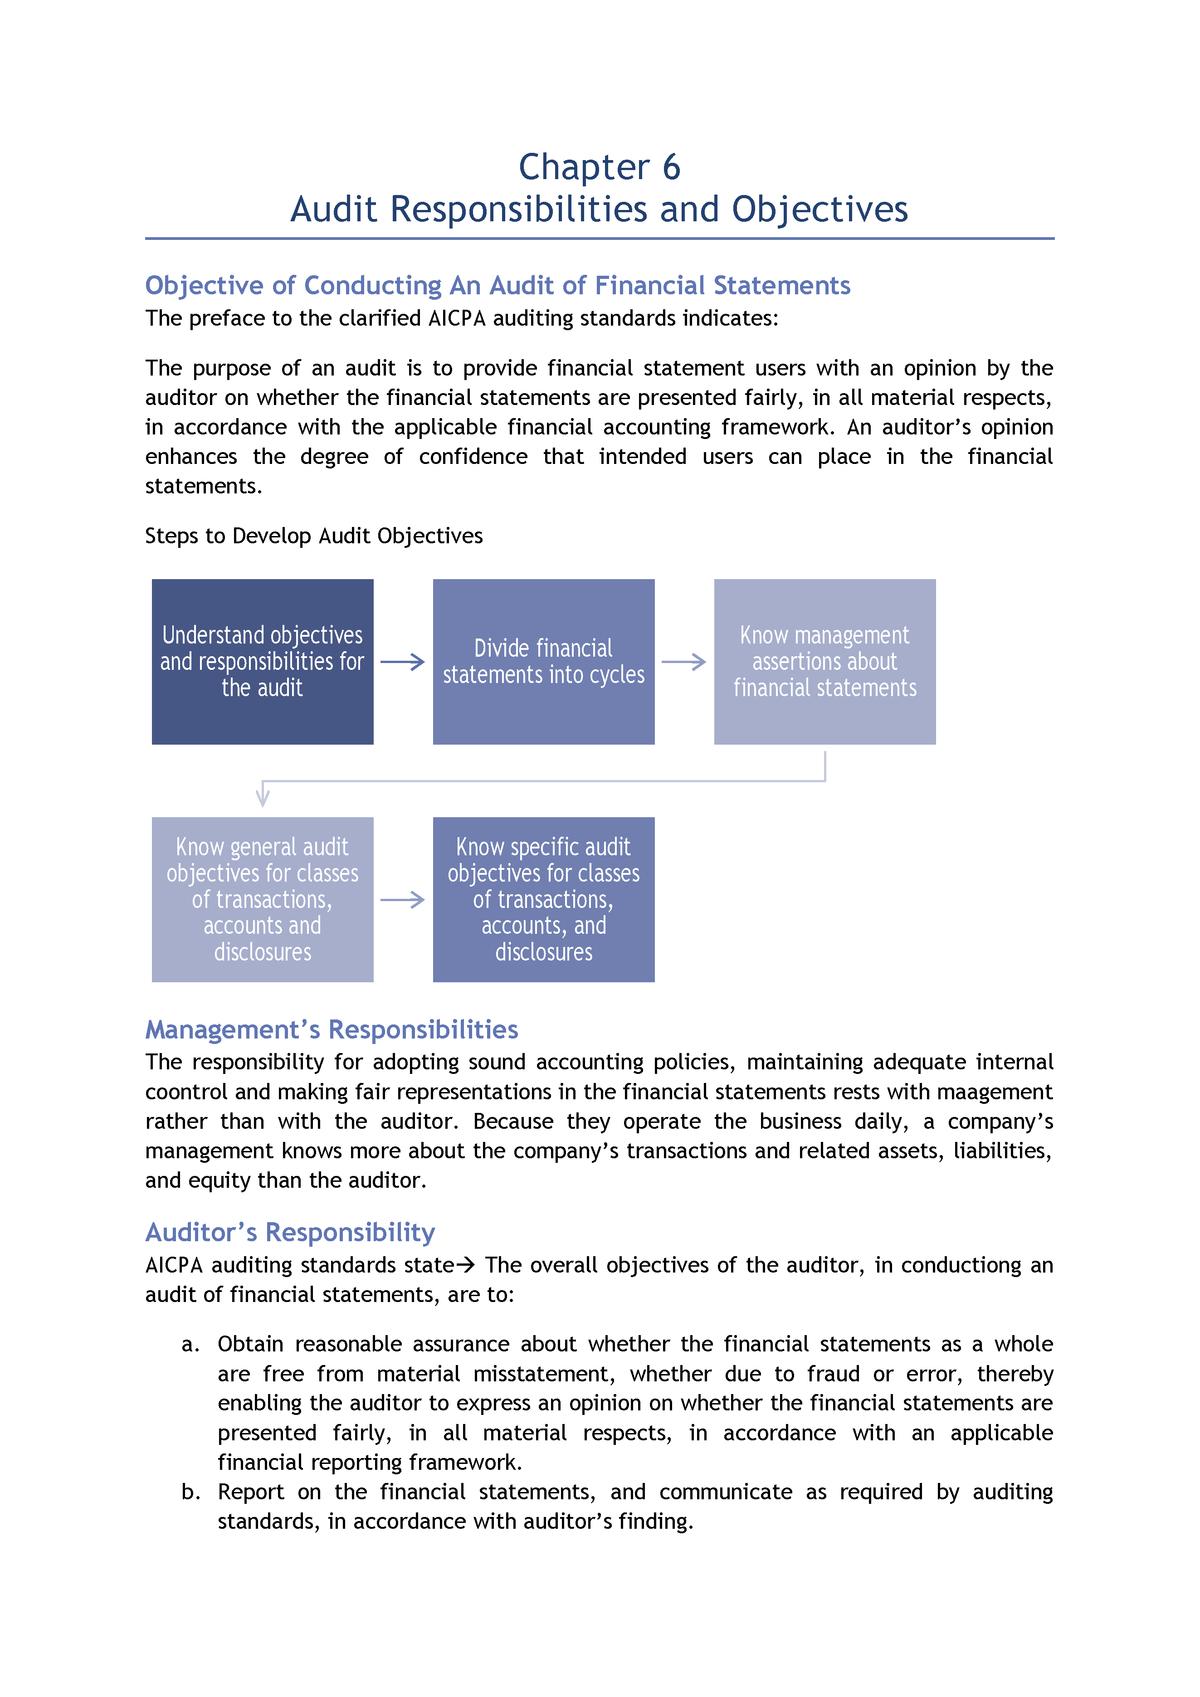 Ch 6 Audit Responsibilities And Objectives Aka302 Unair Studocu